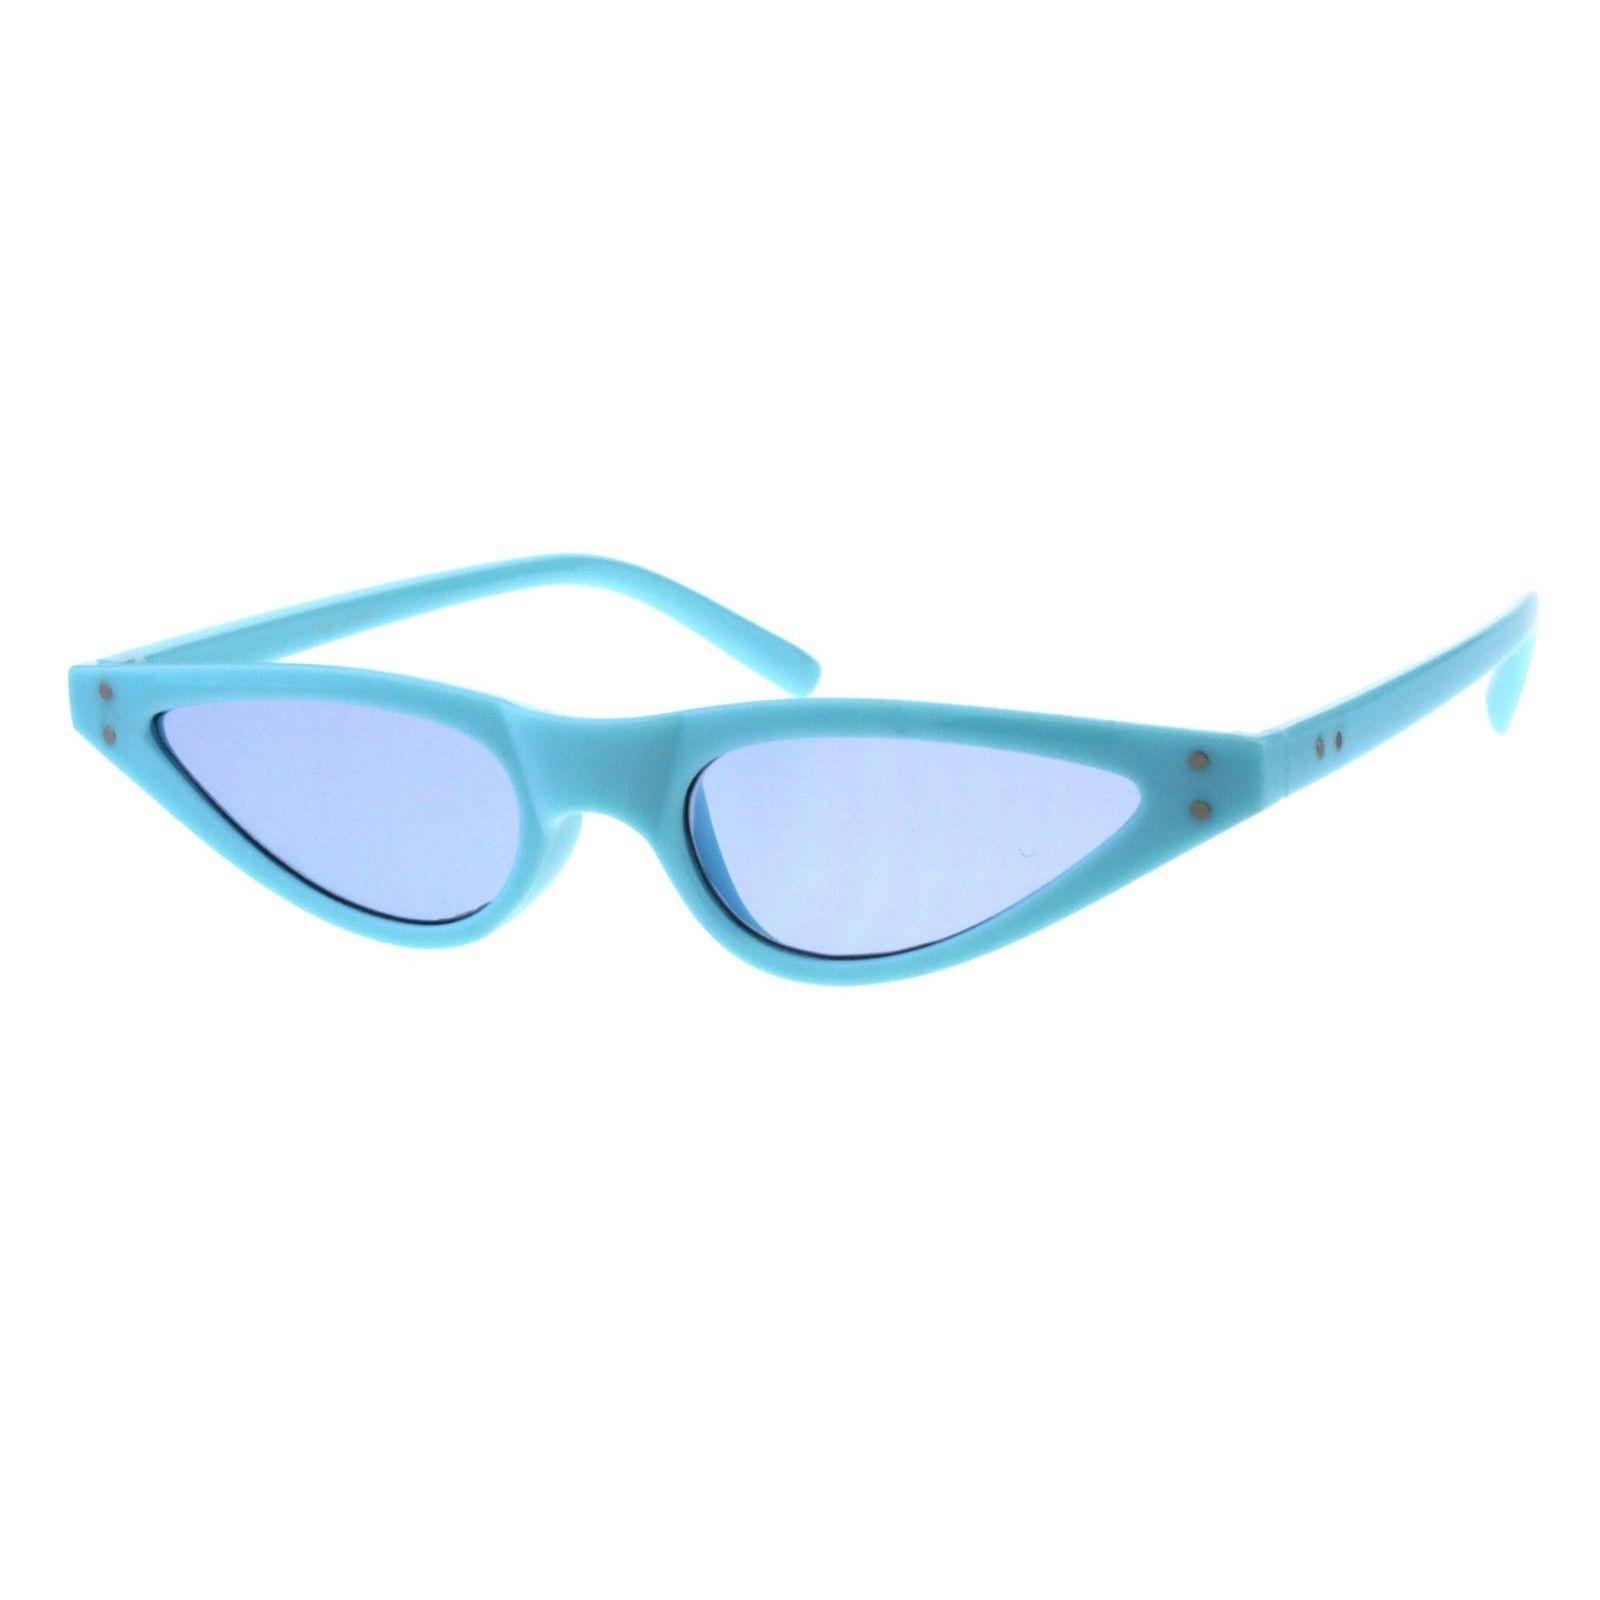 Womens Sunglasses Trendy Skinny Small Flat Cateye Oval Frame UV 400